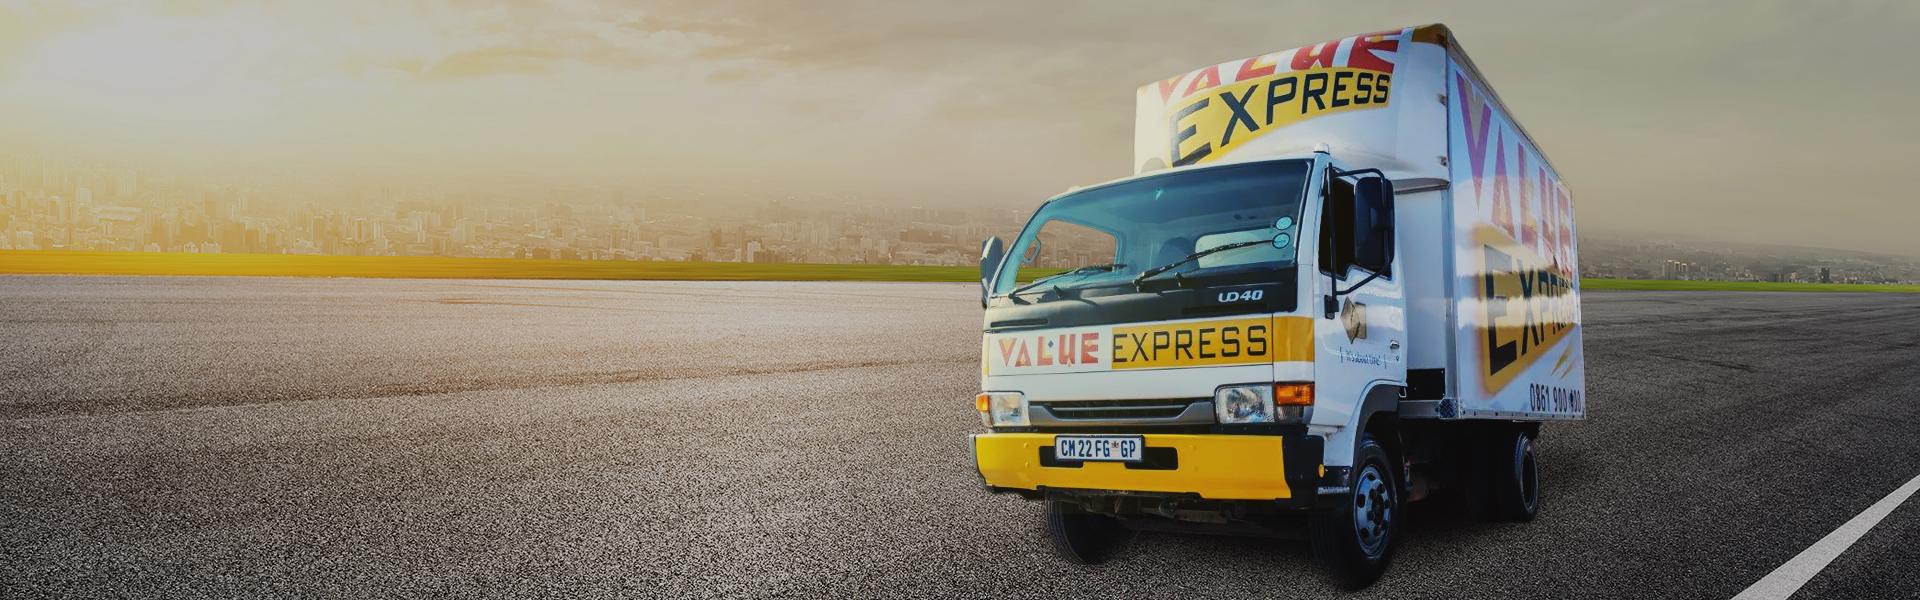 Value Express, Home, Value Express, Value Express